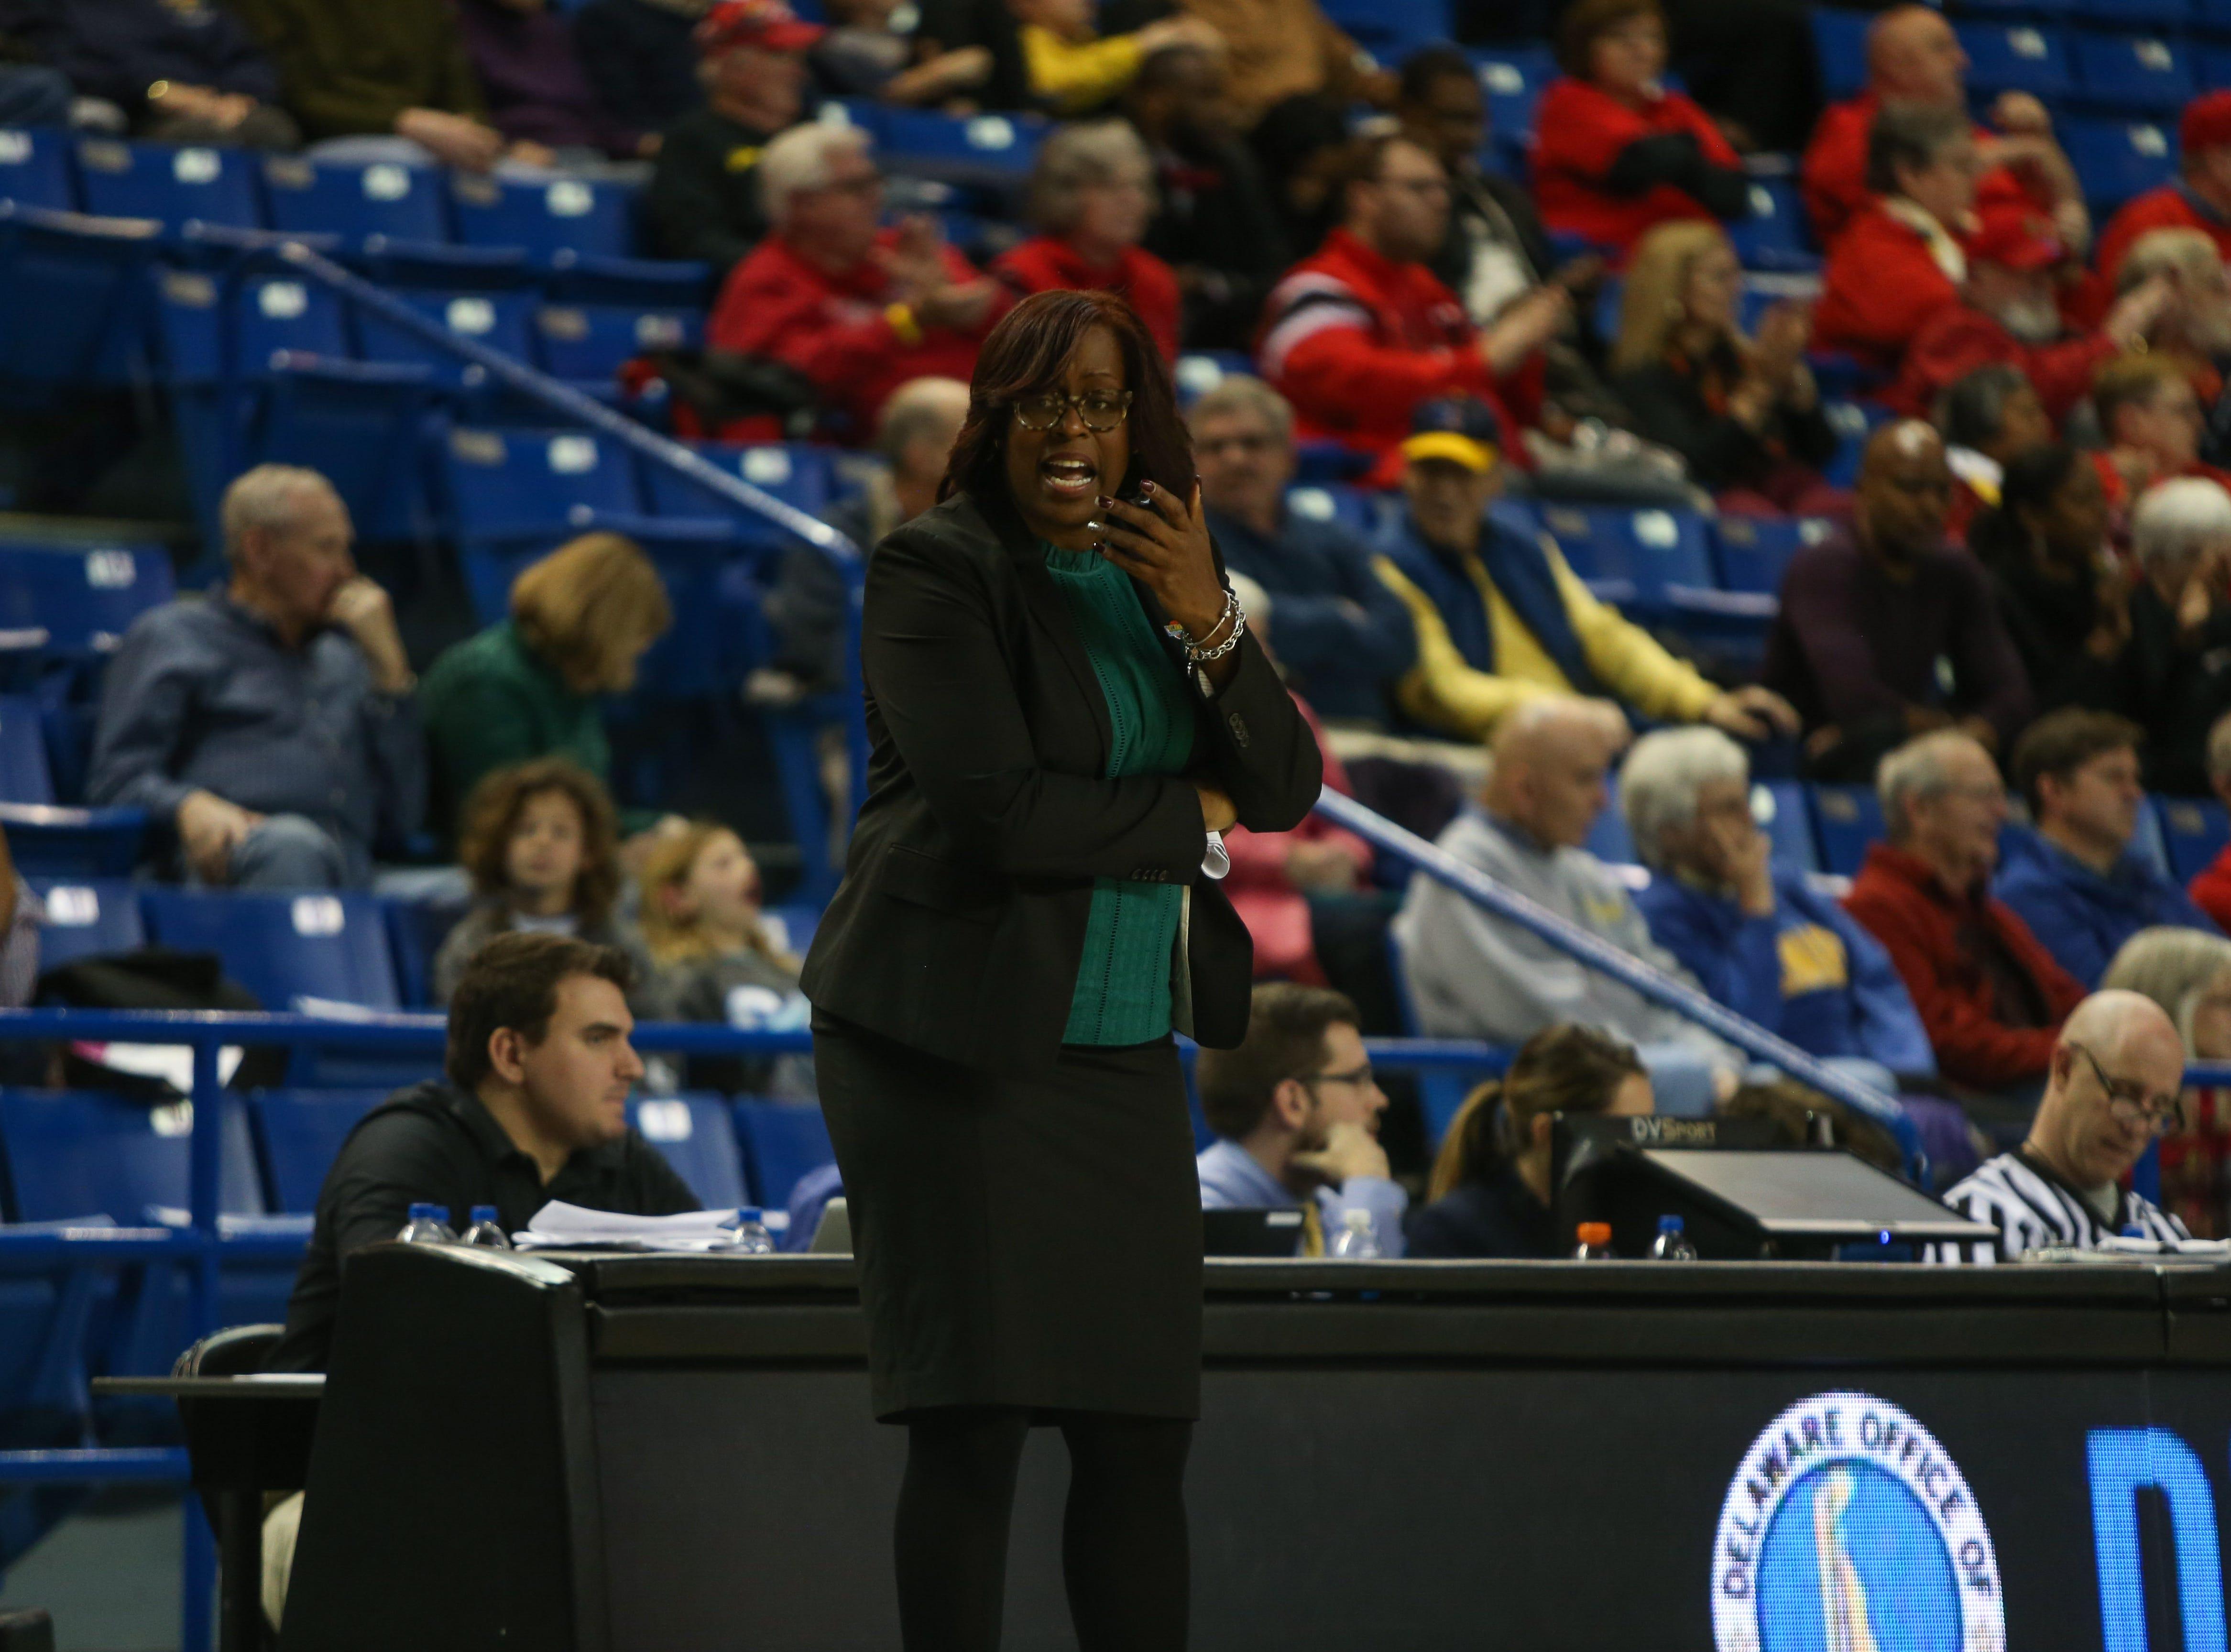 Delaware coach Natasha Adair reacts to a Maryland basket. The University of Delaware women's basketball team falls to No. 5 University of Maryland 77-53 at the Bob Carpenter Center Thursday.